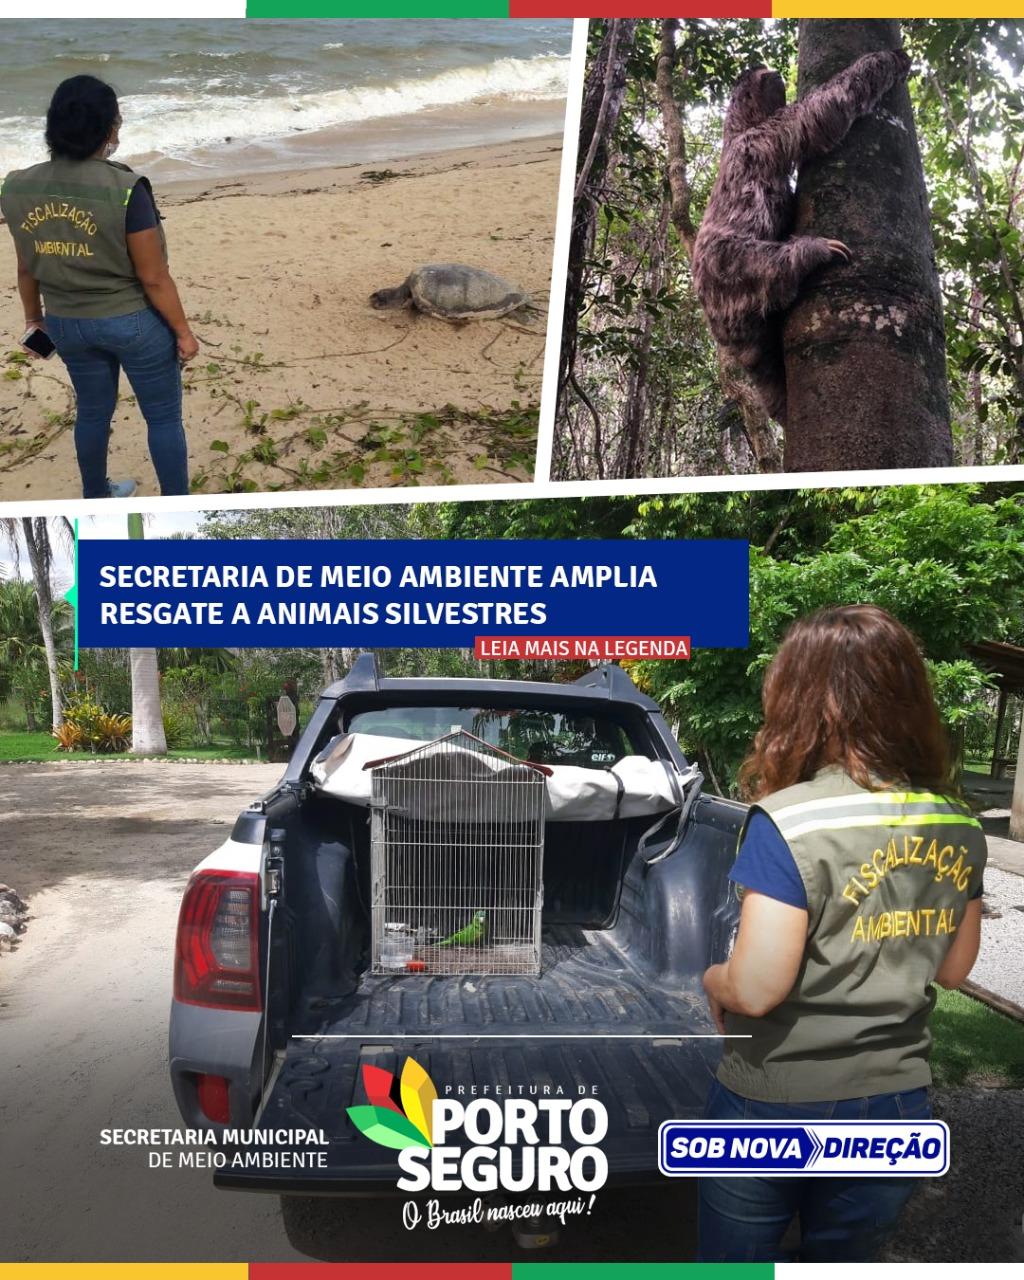 Secretaria de Meio ambiente amplia resgate a animais silvestres 18